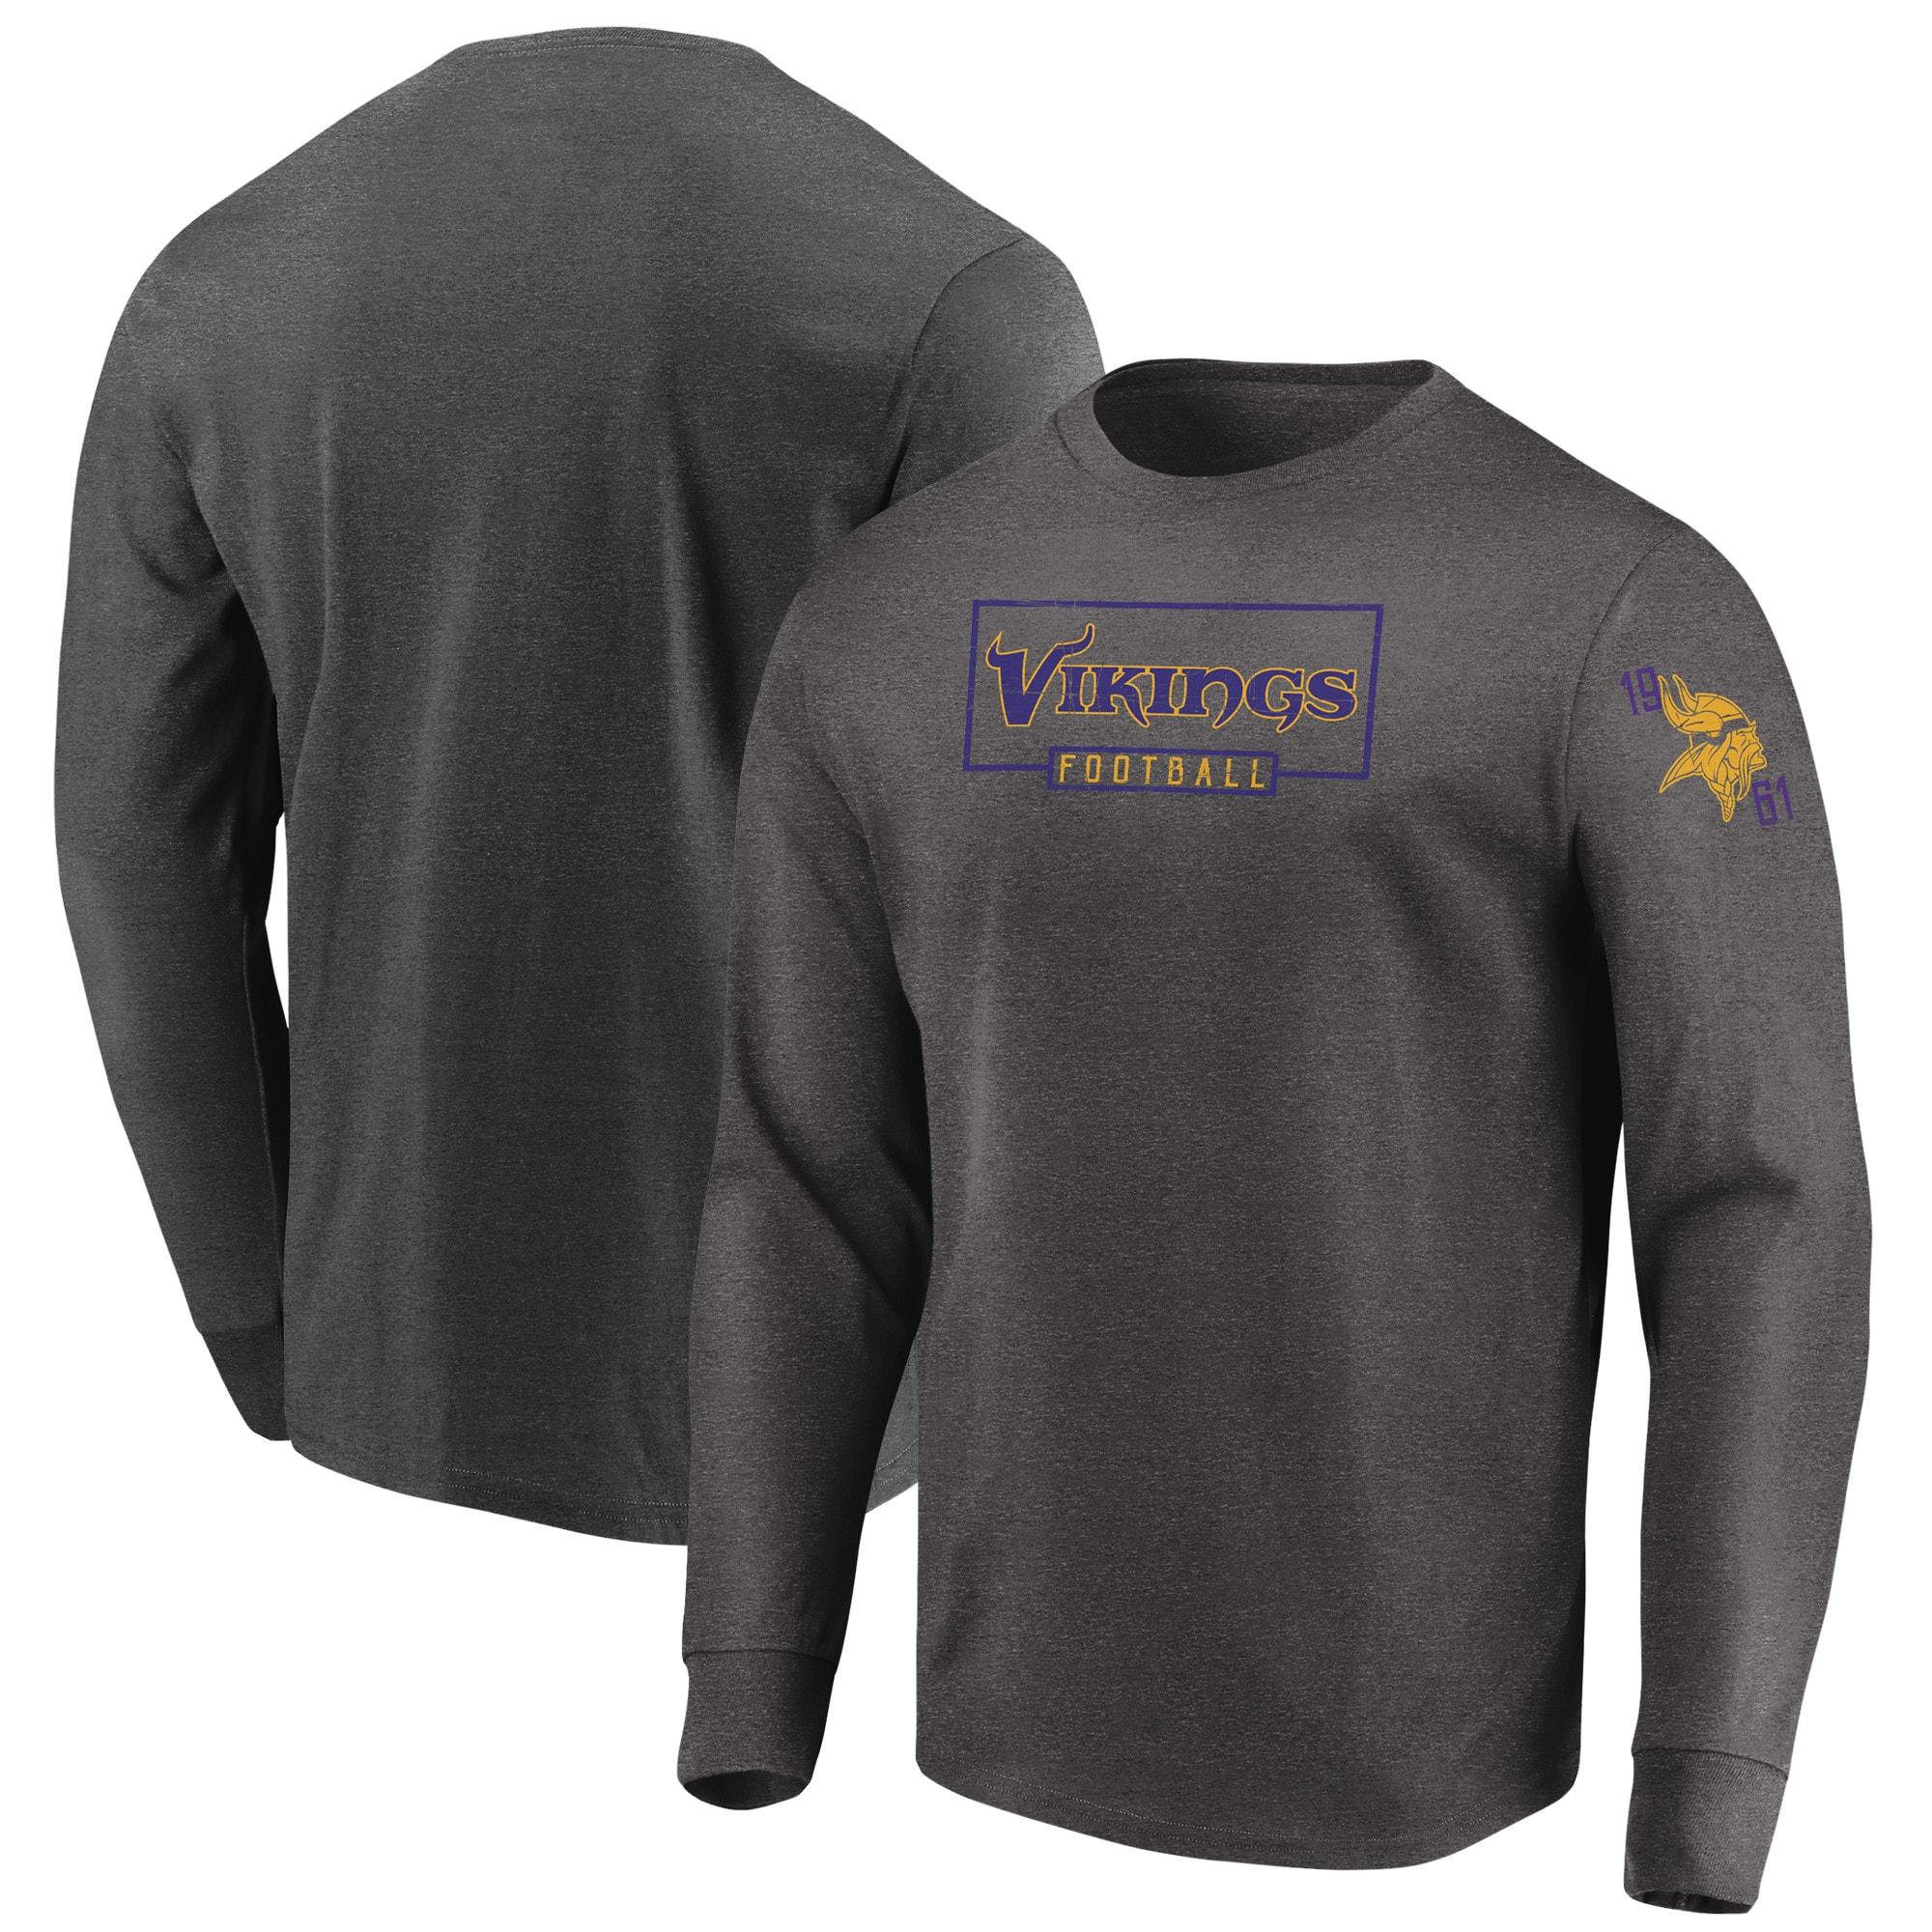 Minnesota Vikings Majestic Big & Tall Kick Return Long Sleeve T-Shirt - Heathered Charcoal